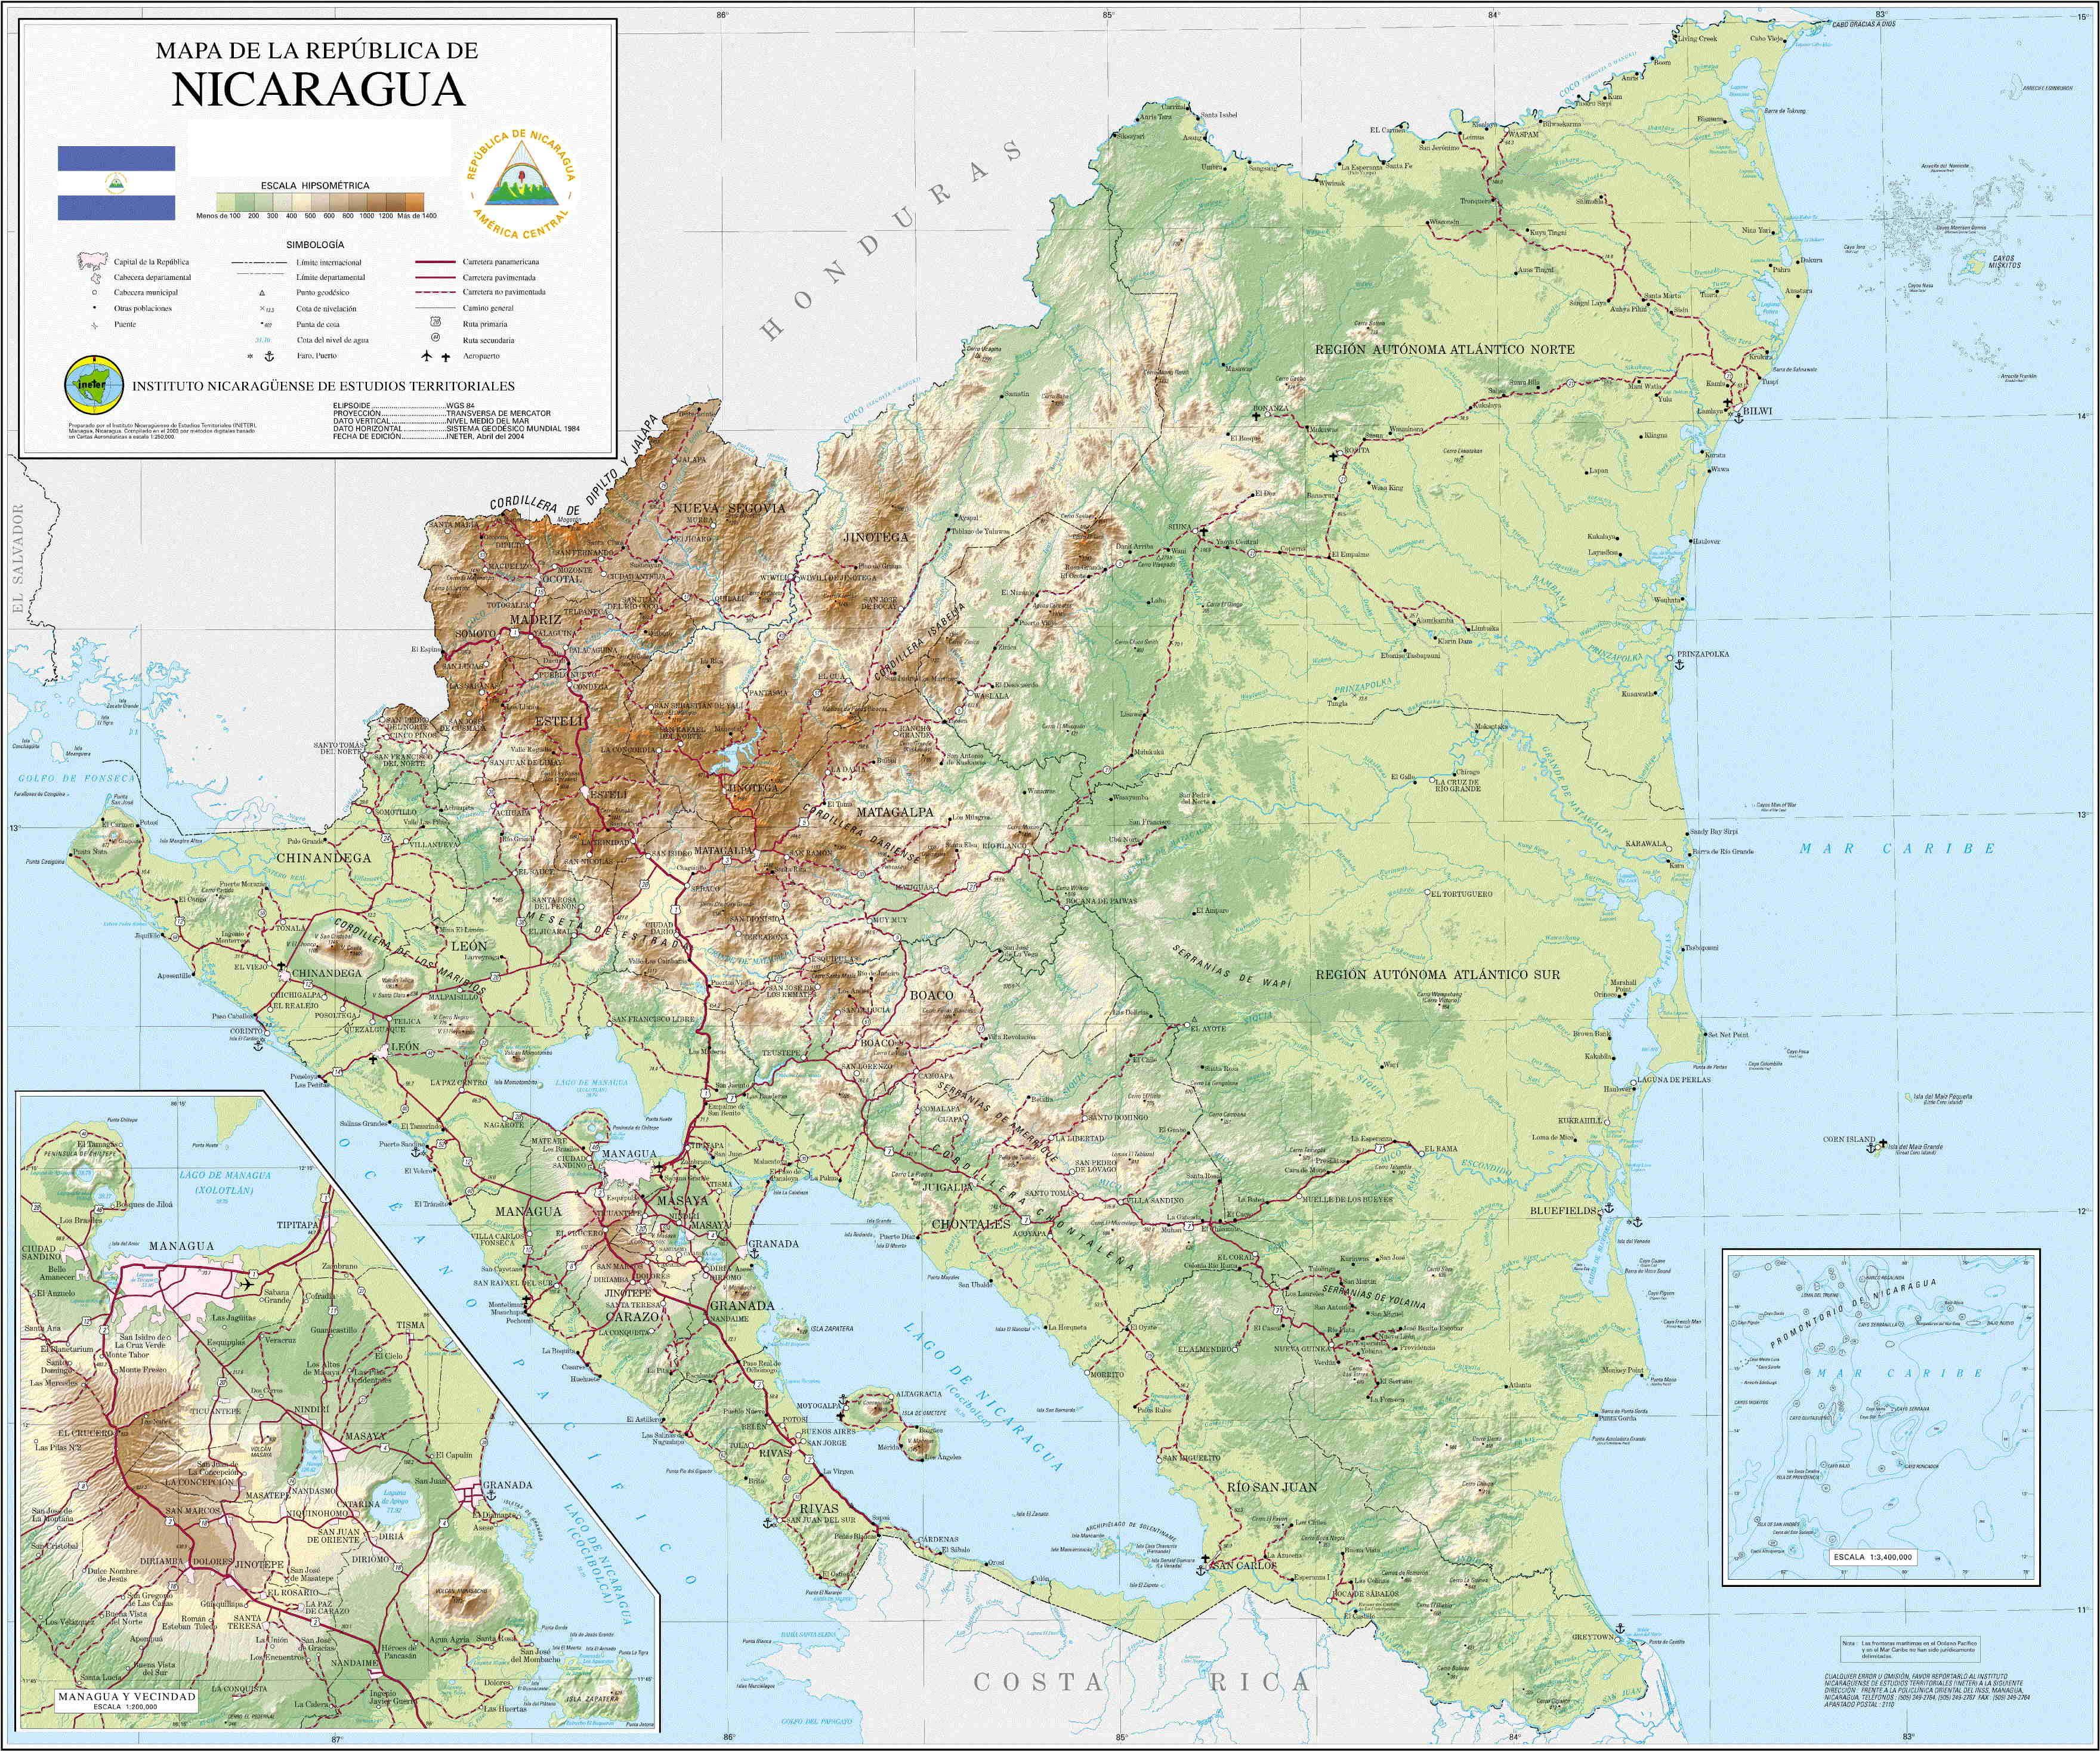 Mapa de Relieve Sombreado de Nicaragua